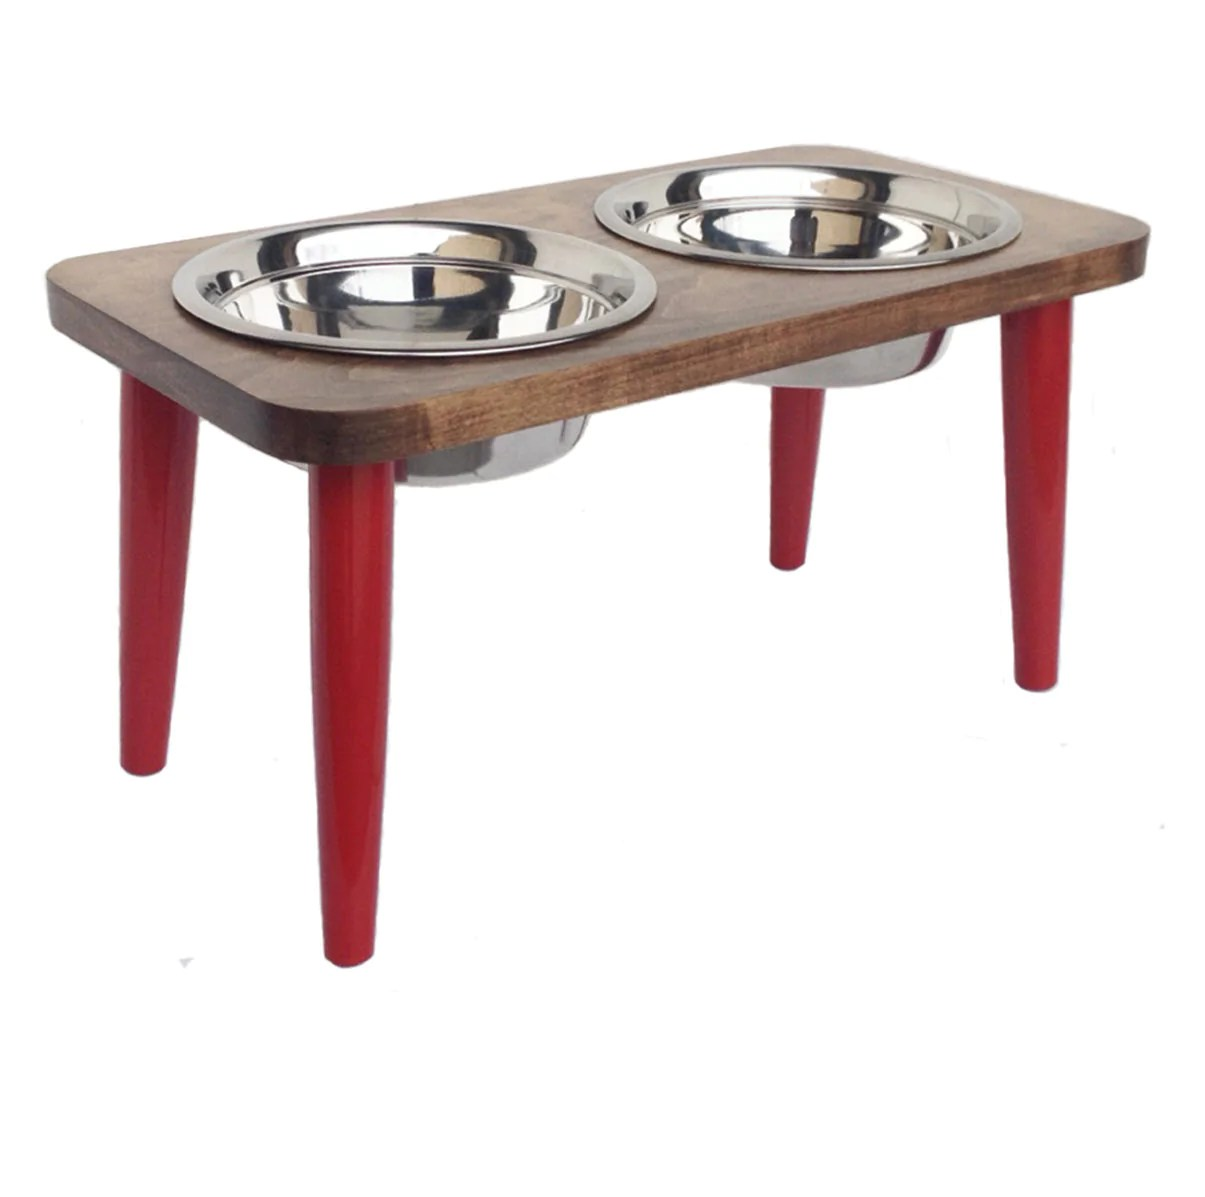 Arresting Nmn Designs Elevated Dog Bowl Stand Raised Hardwood Red Sourn Maple Diner Elevated Dog Bowls Pets S Nmn Elevated Dog Bowls Elevated Dog Bowls Pottery Barn houzz-03 Elevated Dog Bowls